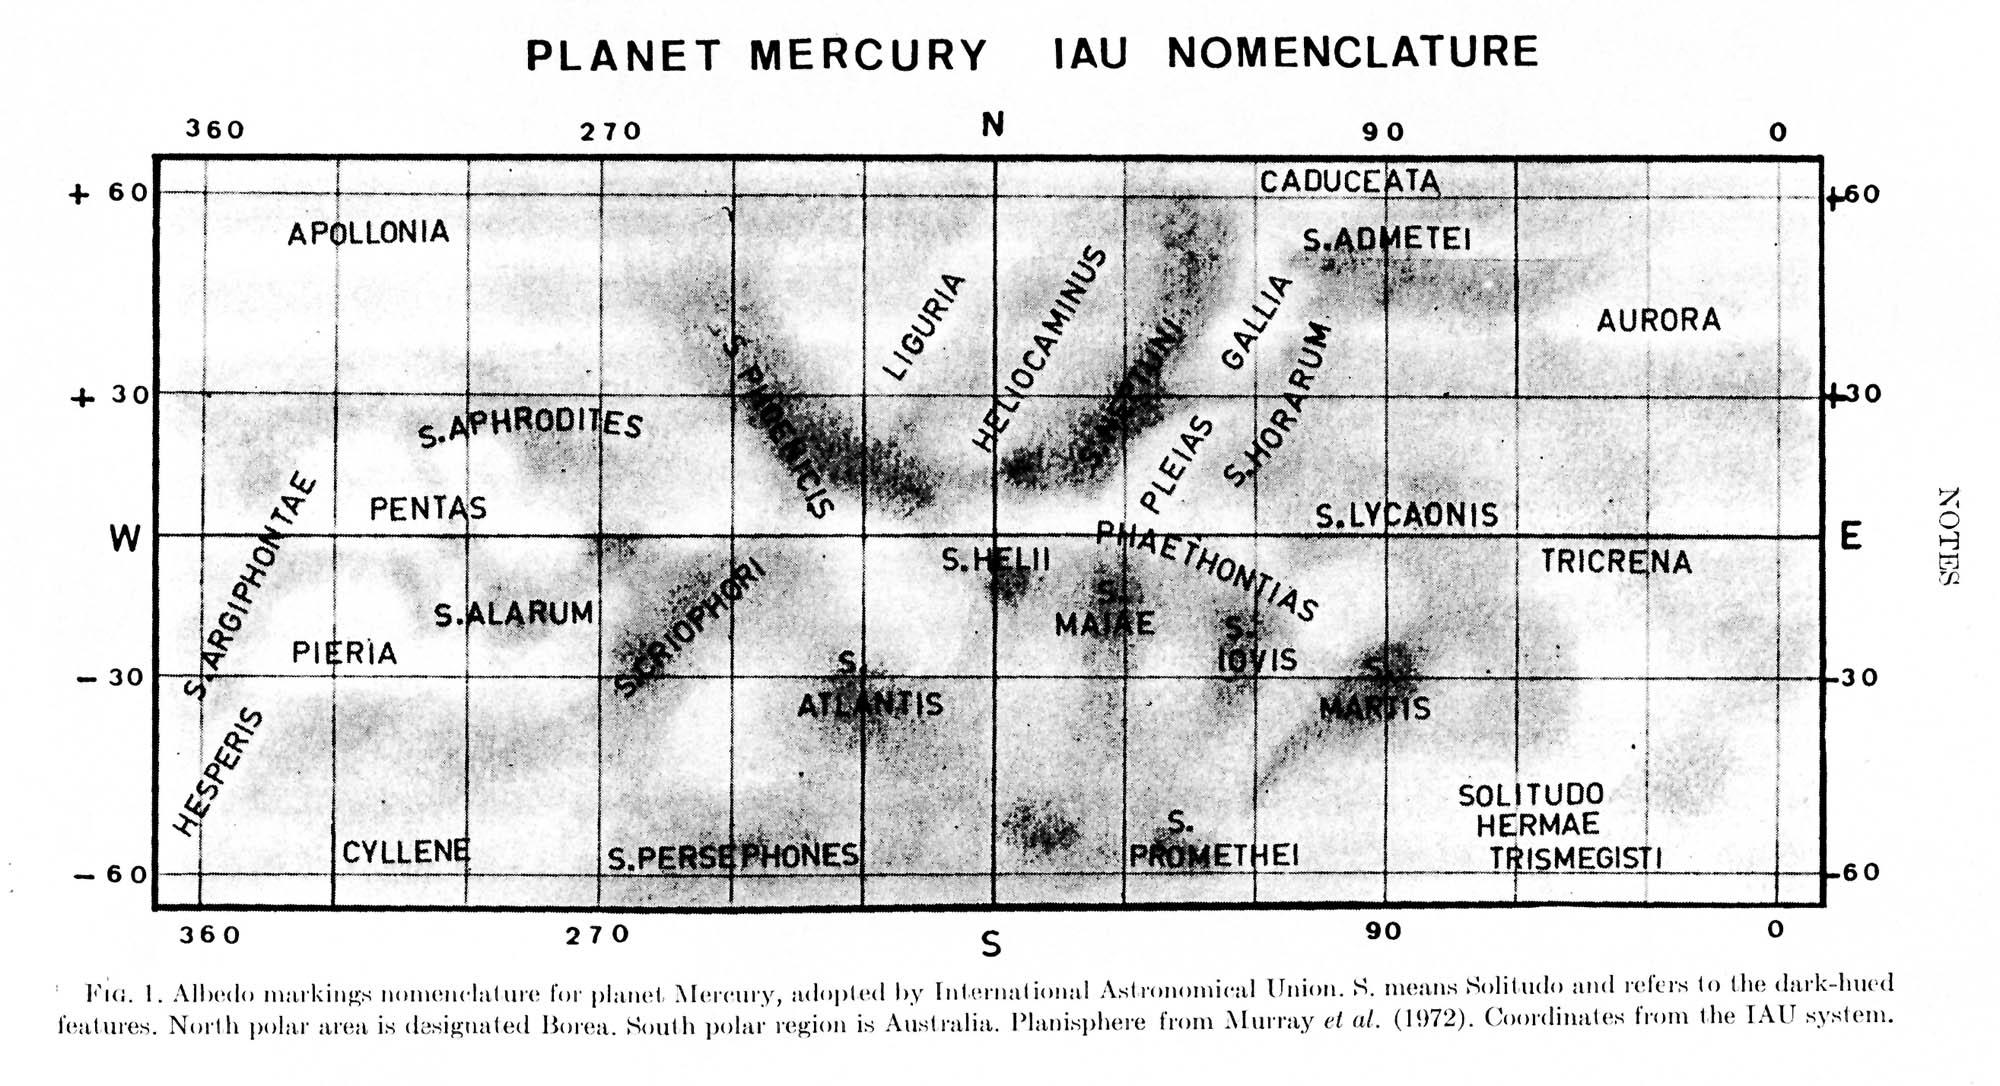 saturn planet elevation maps - photo #28